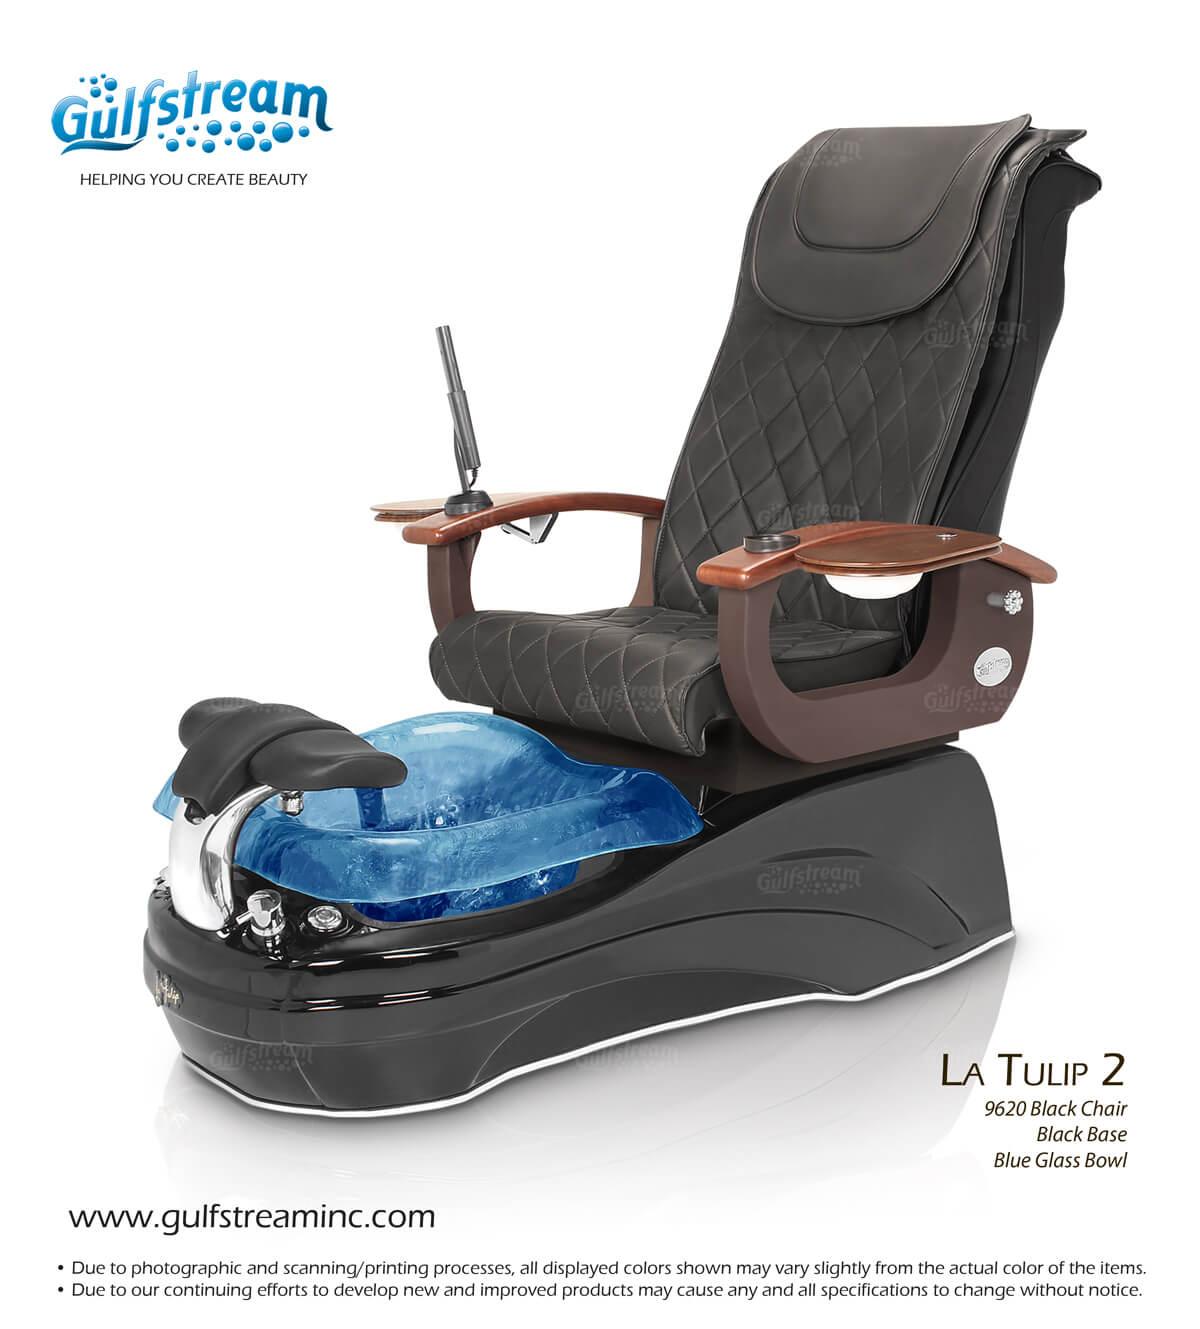 spa pedicure chairs canada best inc ferdinand in la tulip 2 chair salon furniture toronto usf